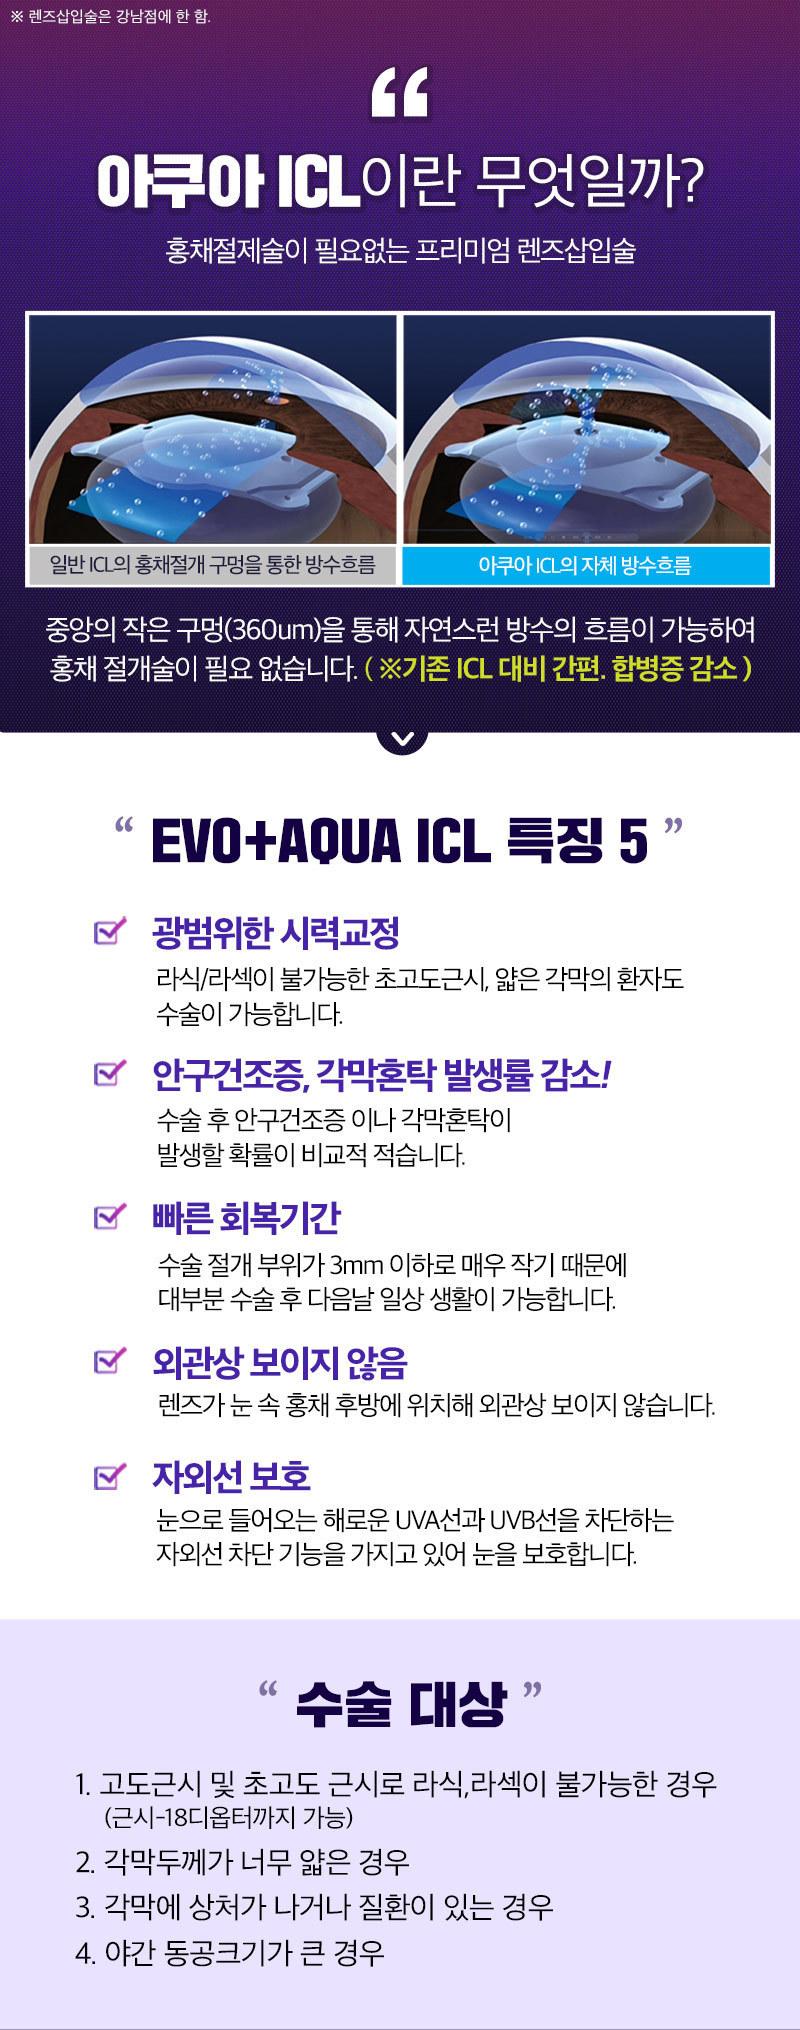 D event info e1aa70da26a52654fb